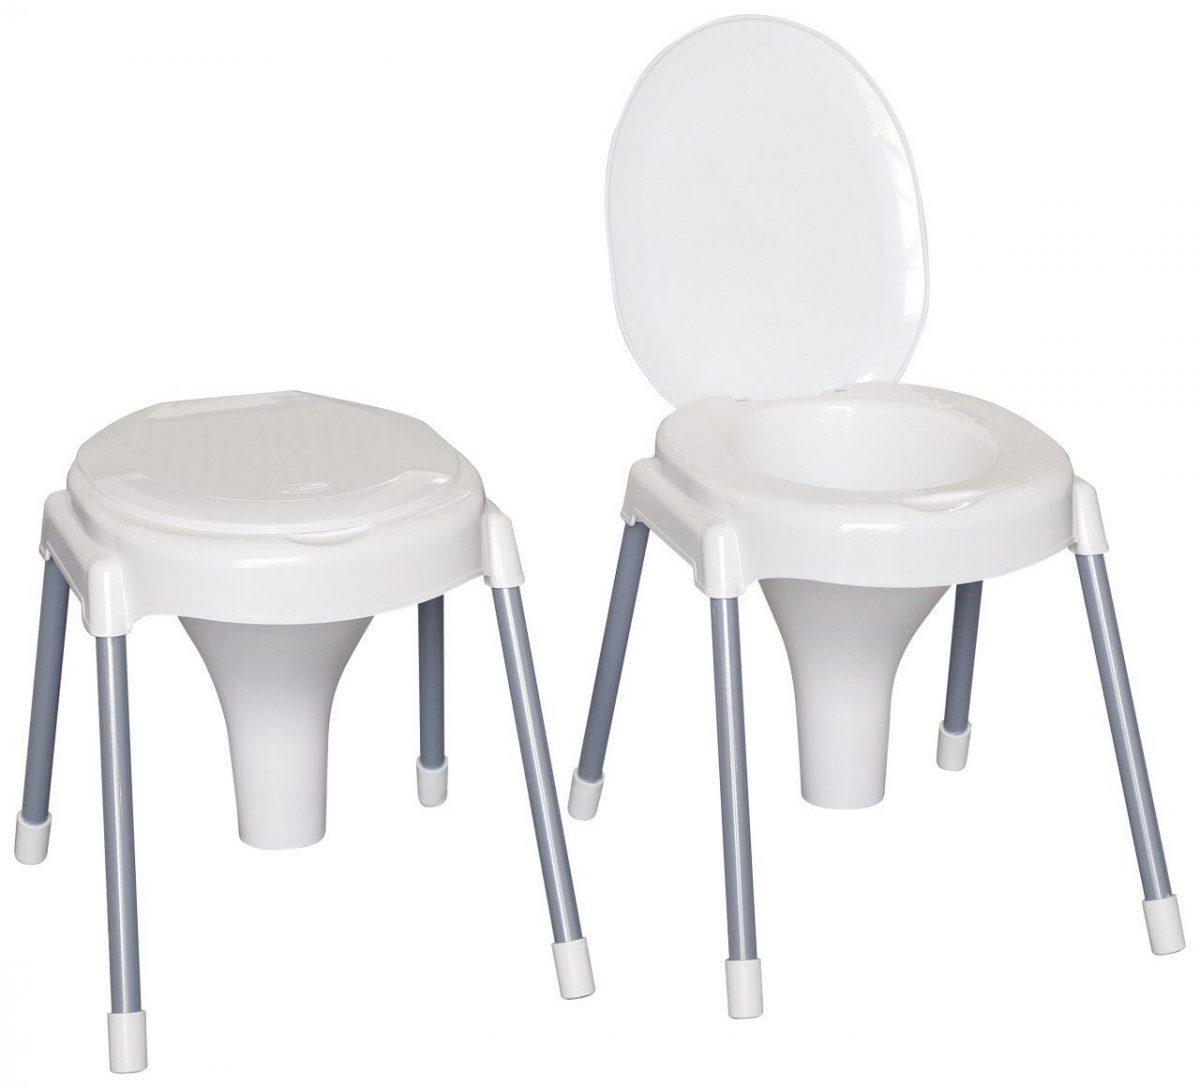 توالت فرنگی ناصر پلاستیک محصول جدید شرکت ناصر